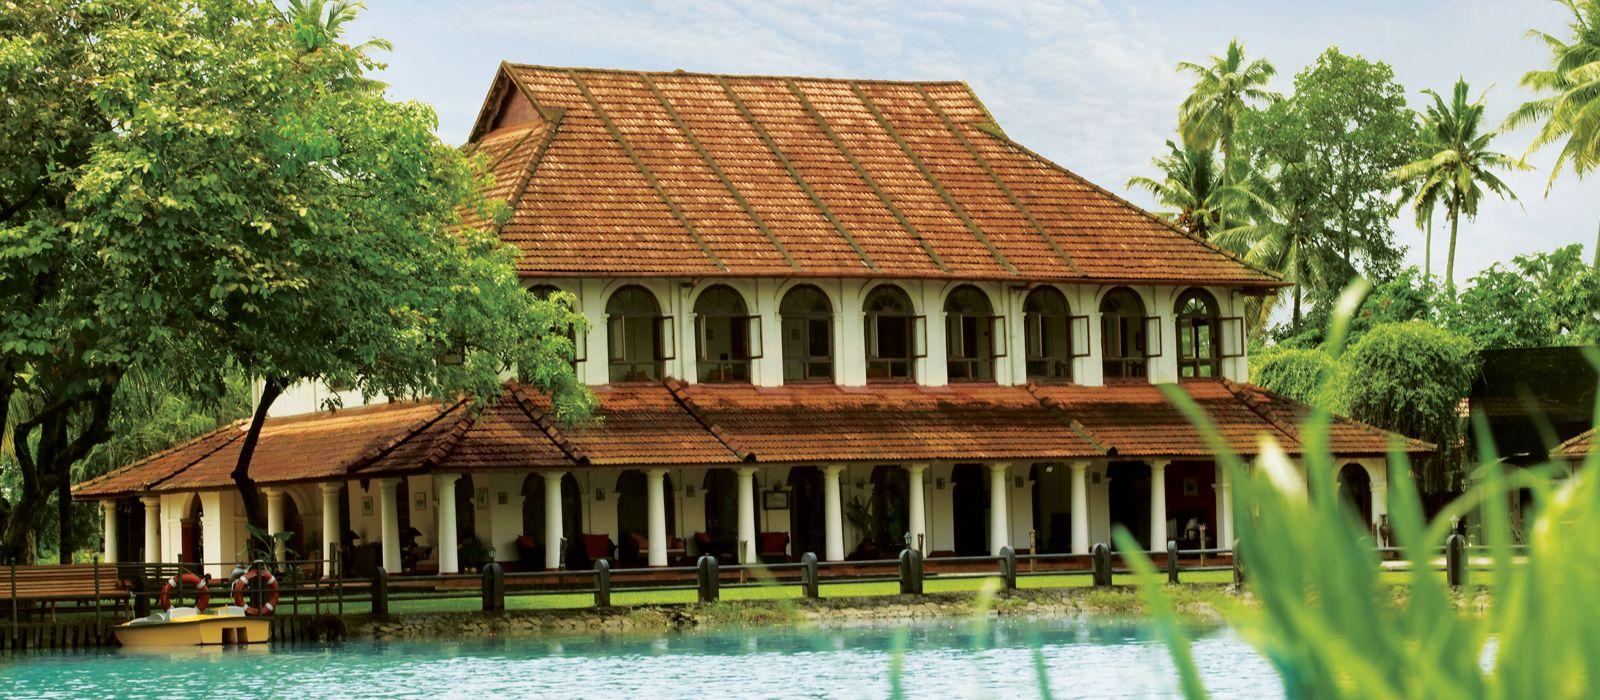 Kerala: Eden of the Tropics Tour Trip 7